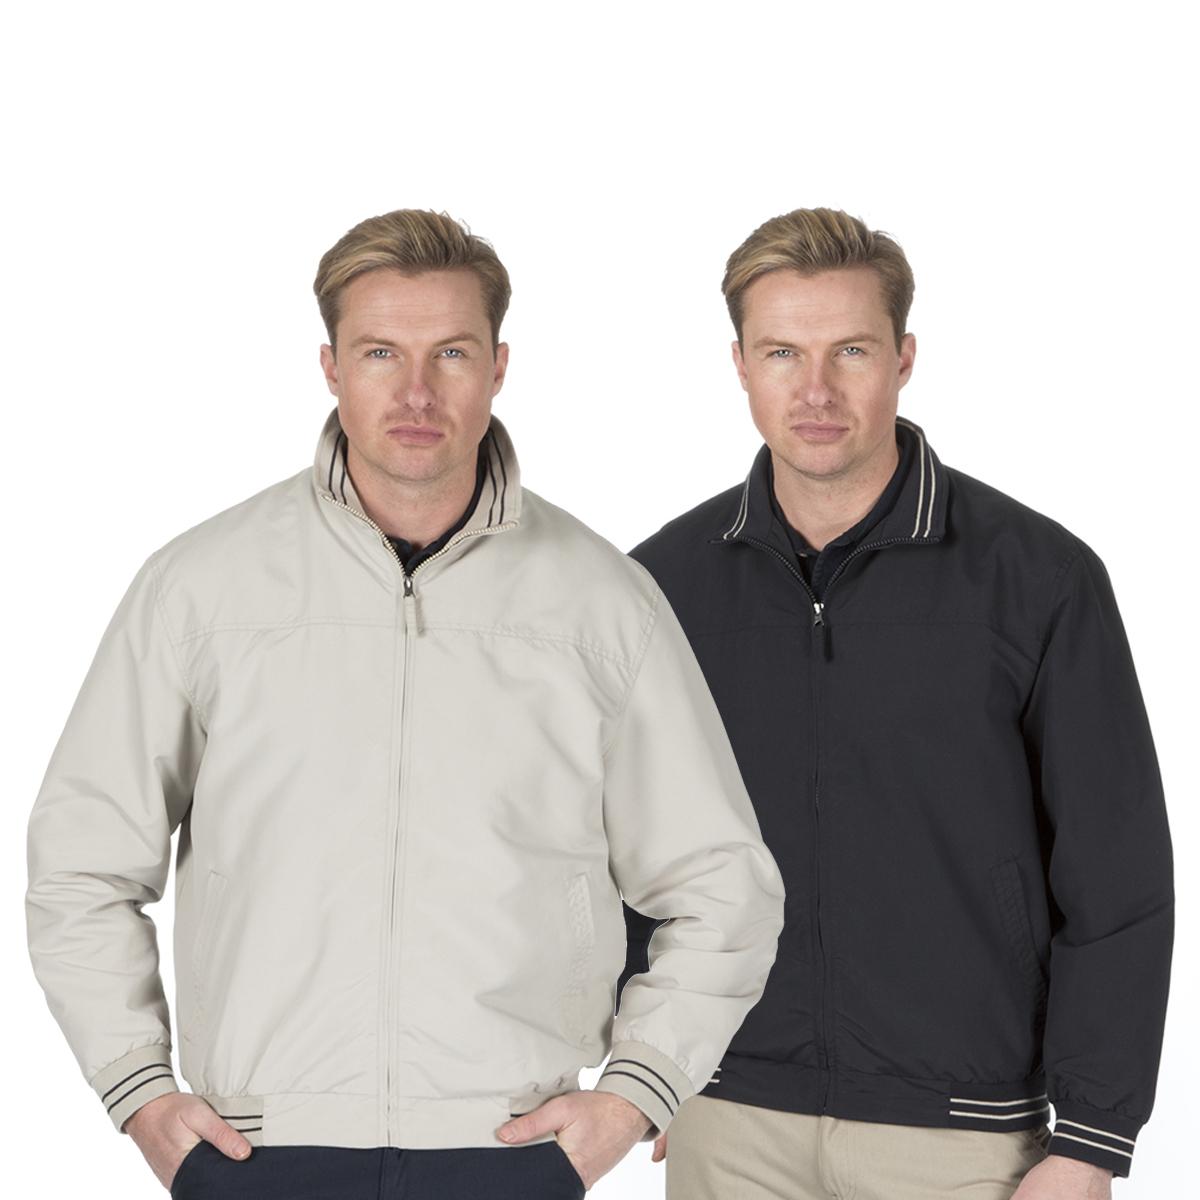 98c7a8370 Details about Men's Microfibre Bomber Jacket Zip Up Coat Harrington Classic  Summer Golf Light